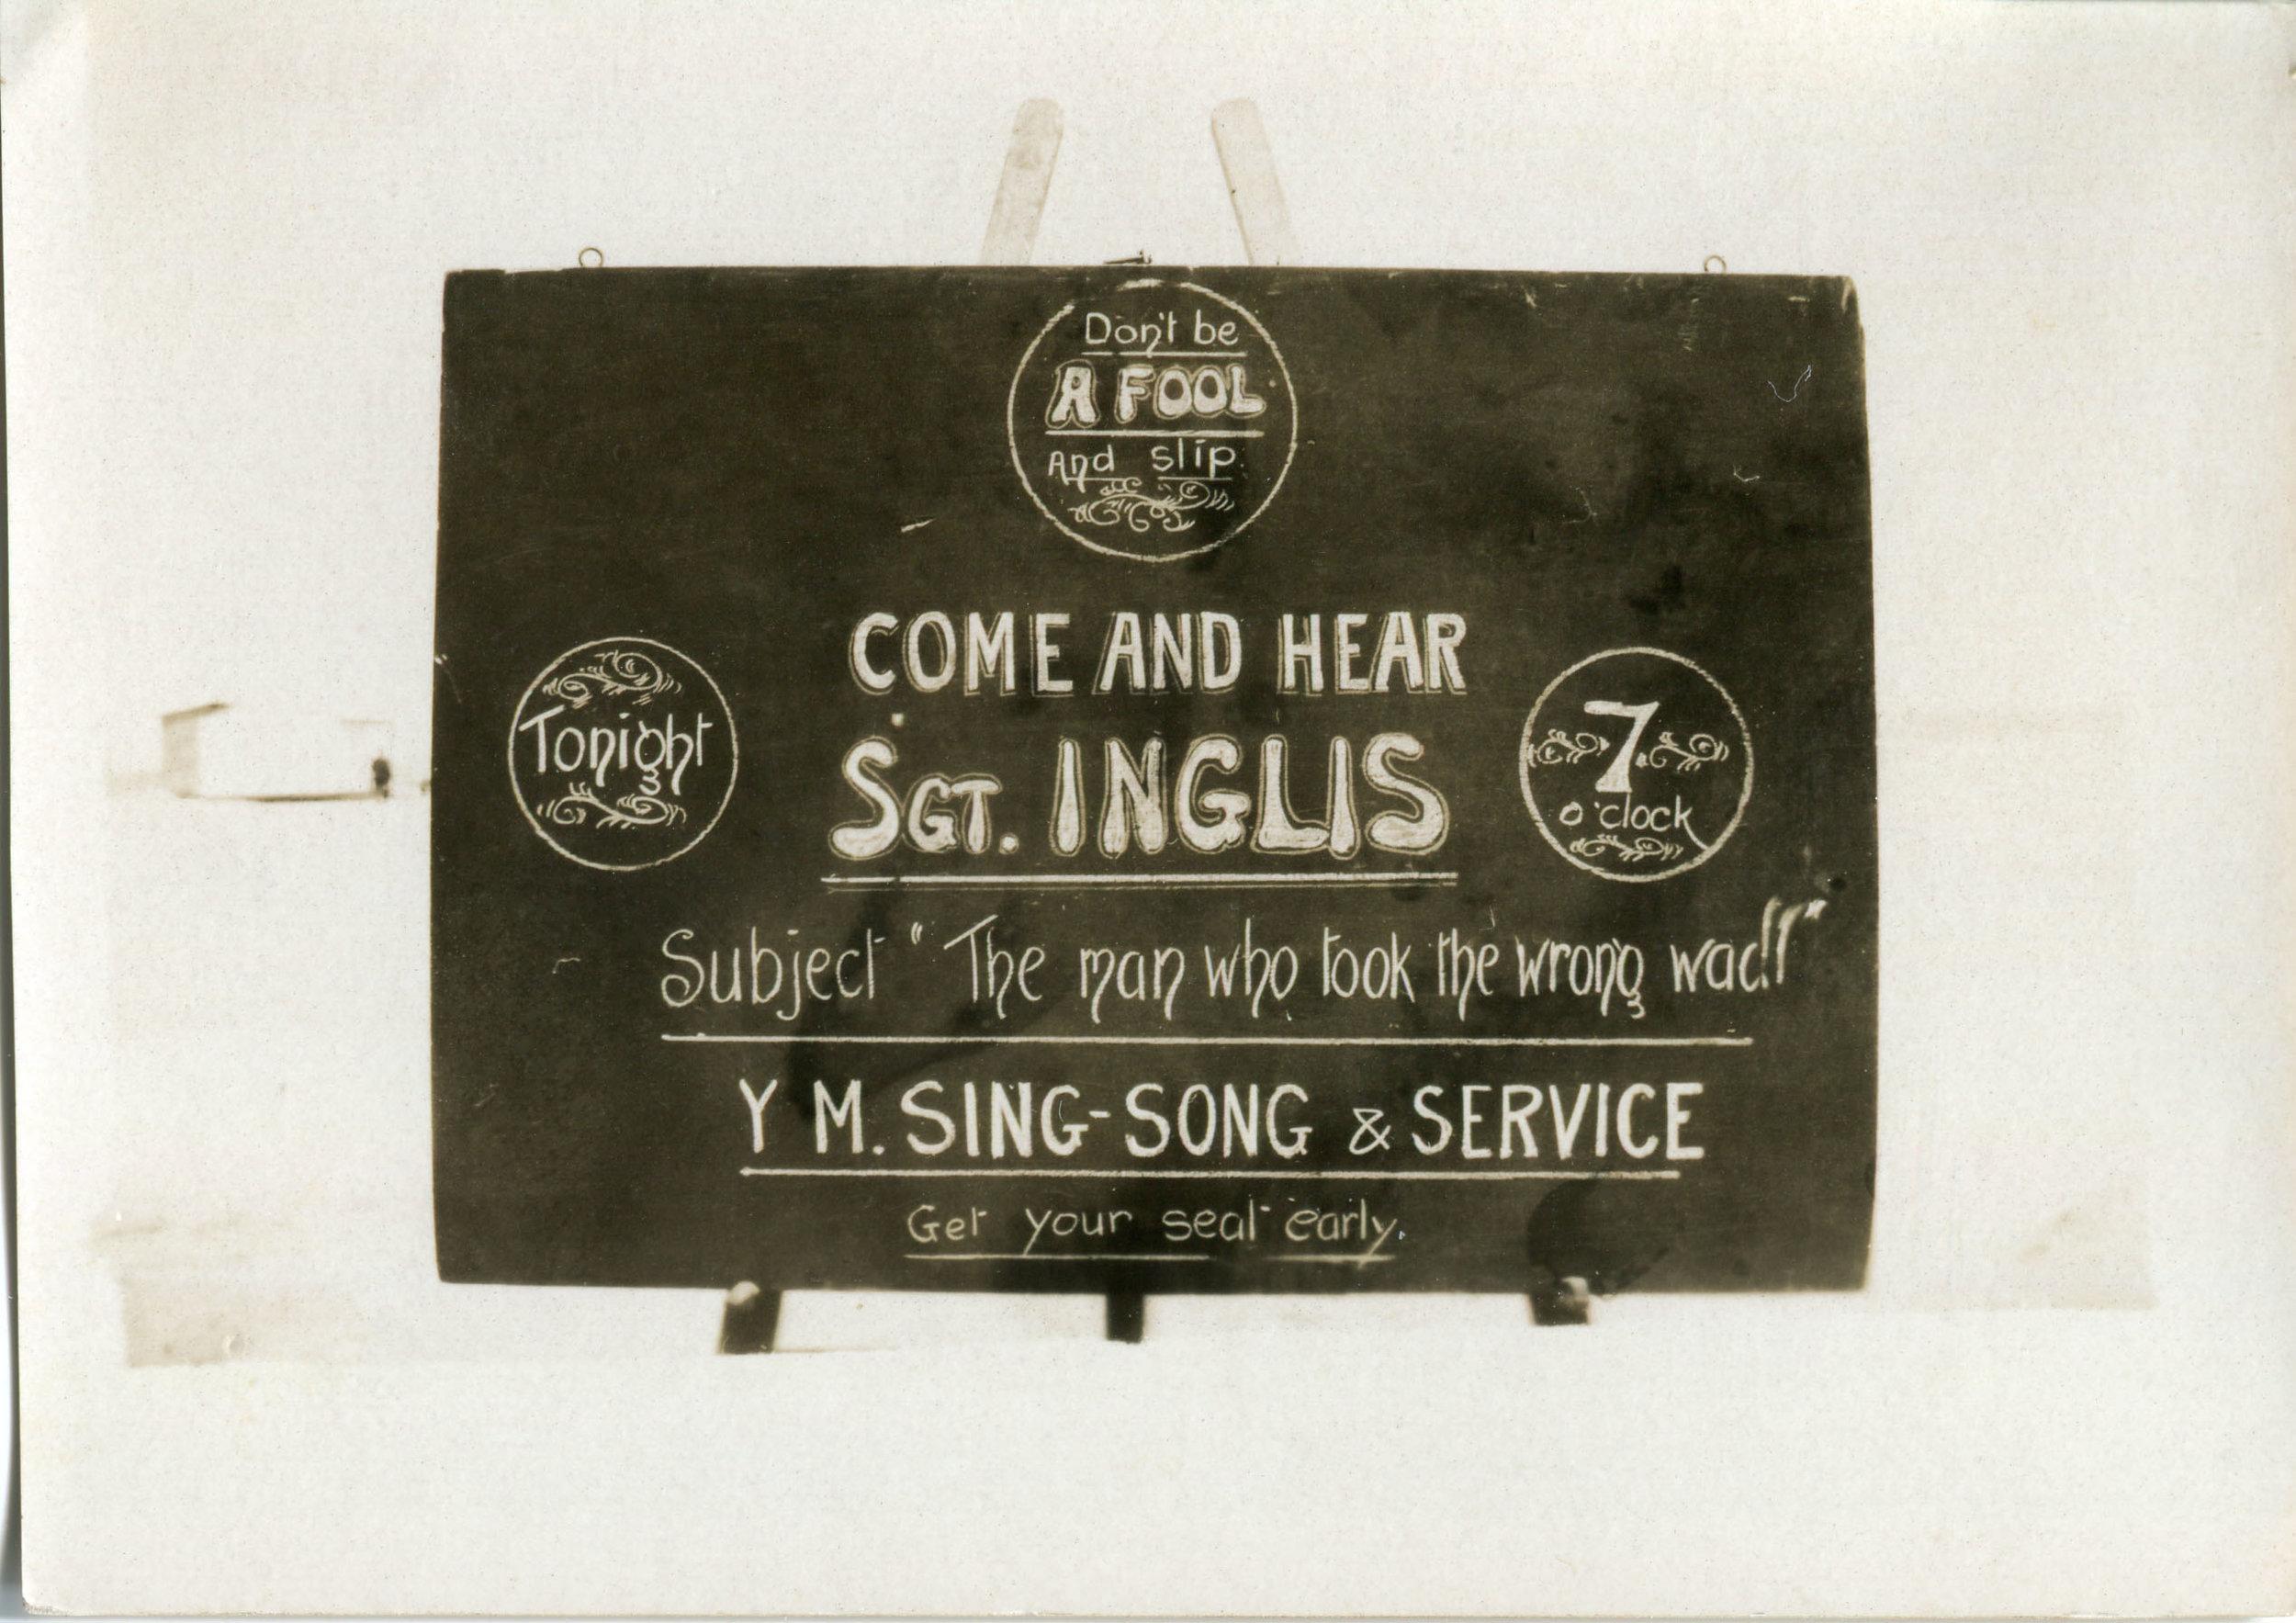 reg walters075 YMCA singsong and service featuring Sergeant Inglis.jpg